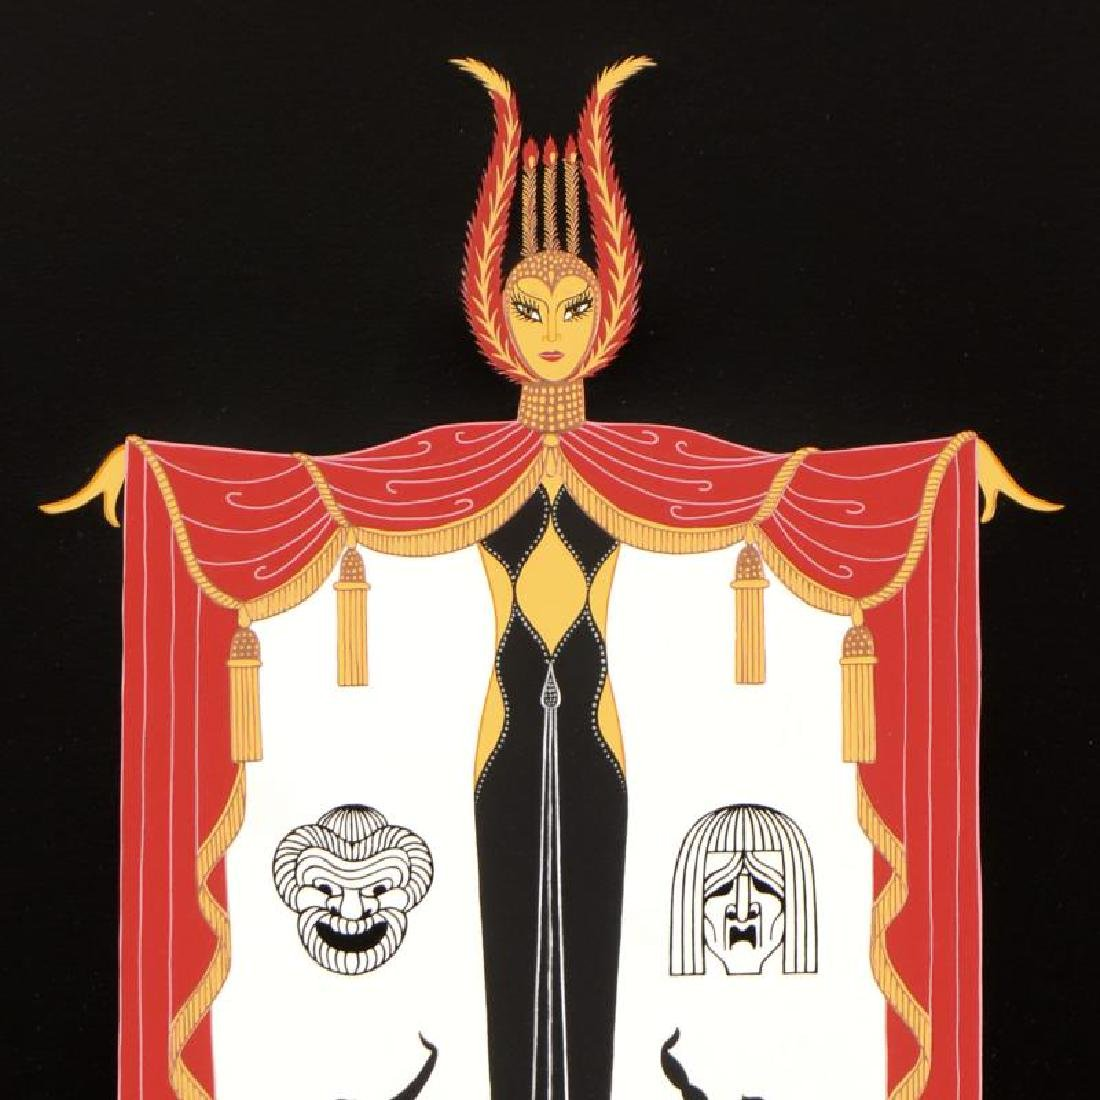 Broadways in Fashion by Erte (1892-1990) - 2